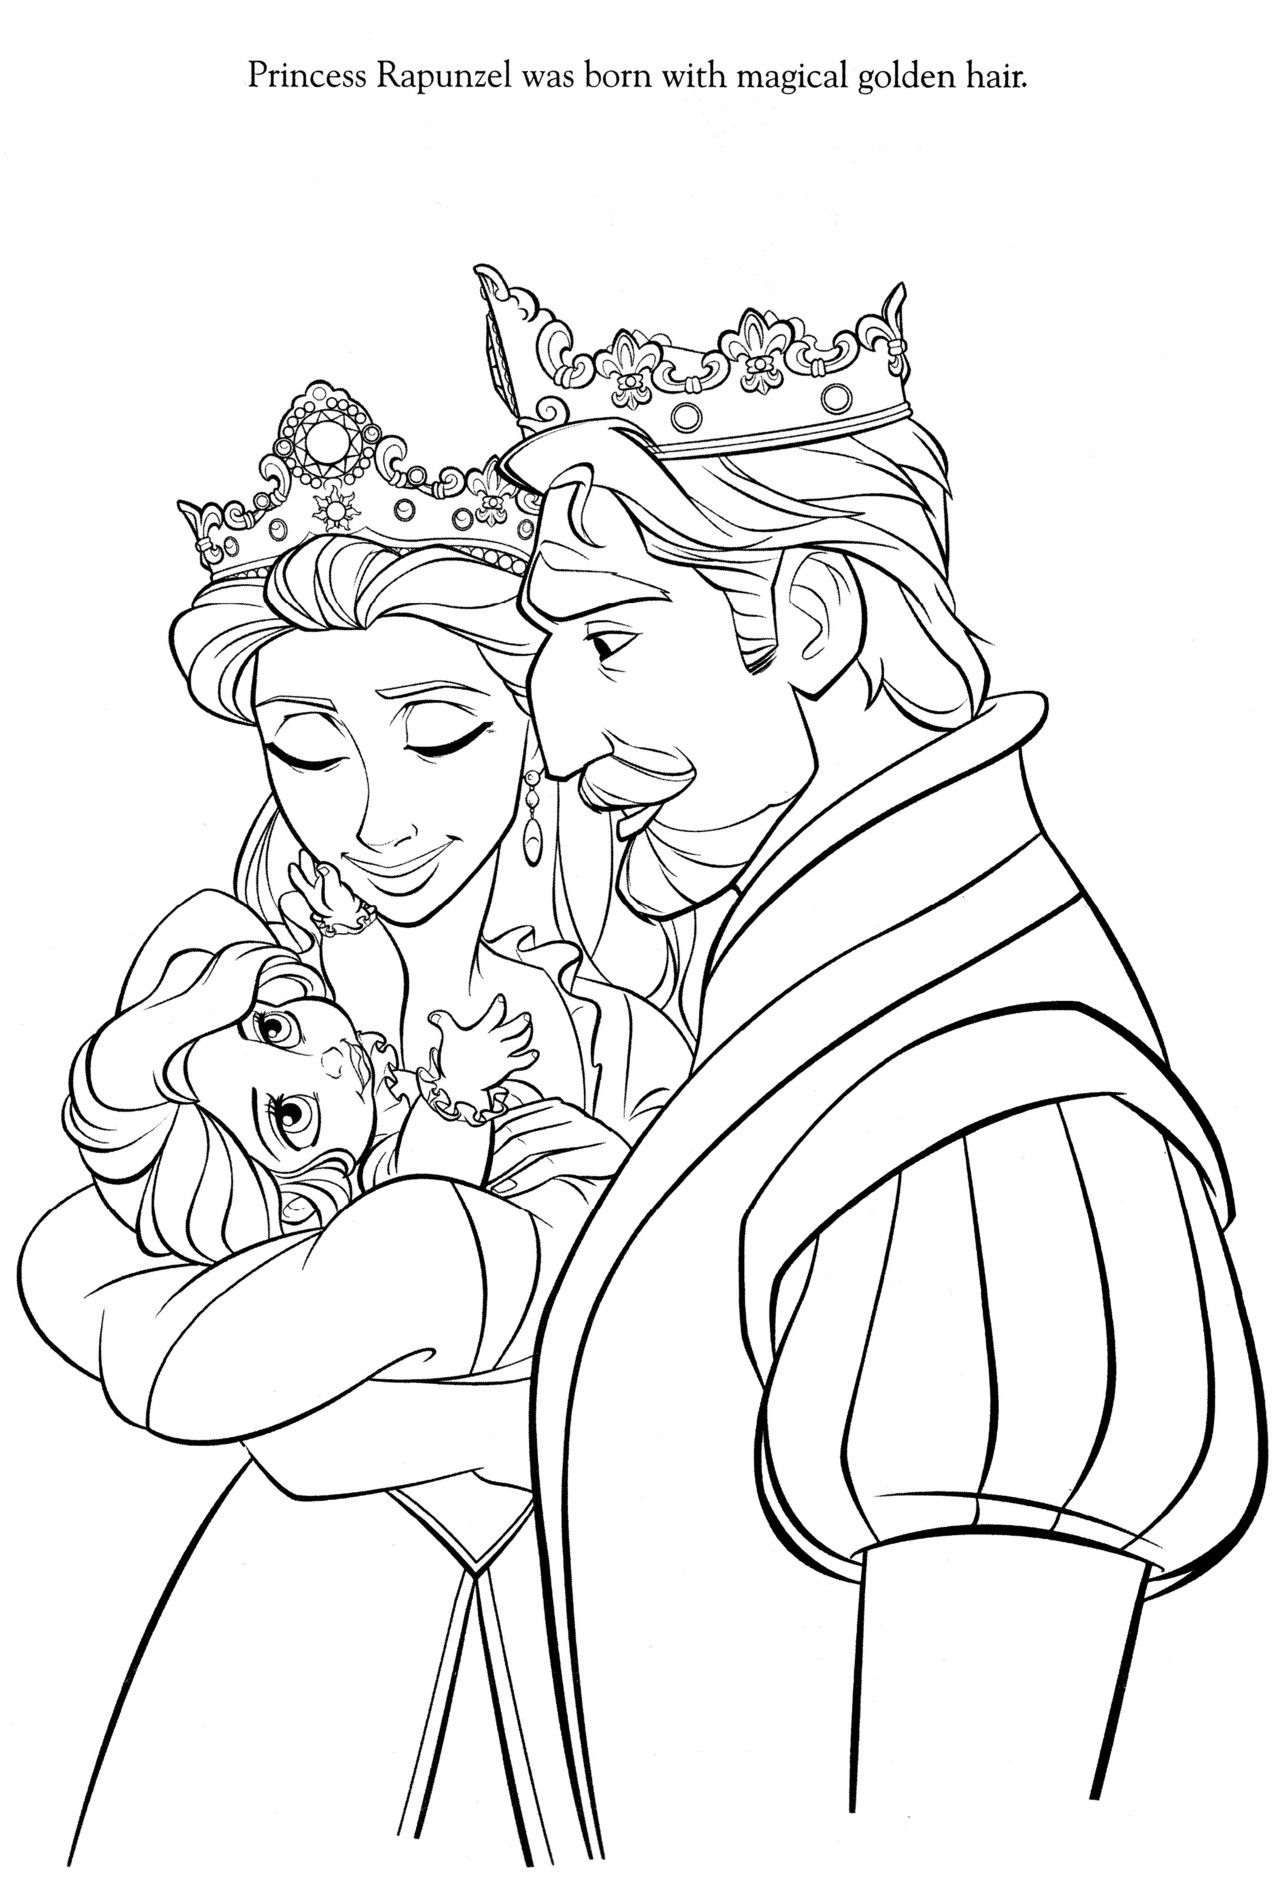 Pin By Ashley Boettger On Disney Coloring Pages Tangled Coloring Pages Rapunzel Coloring Pages Disney Coloring Pages